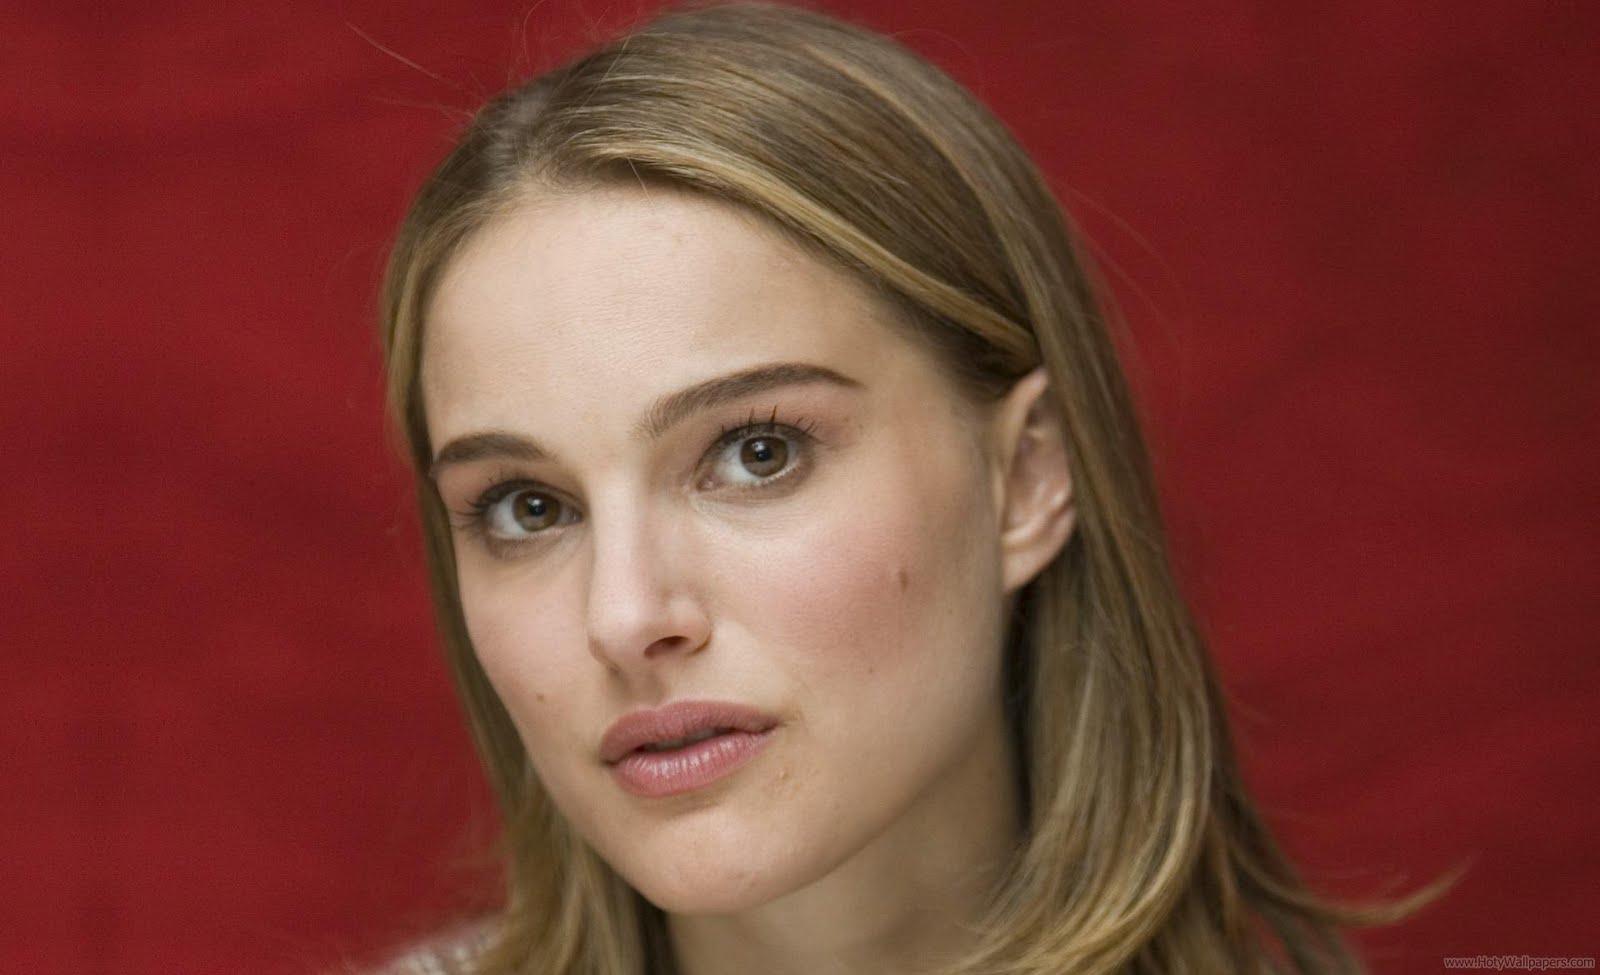 http://3.bp.blogspot.com/-GIs37t8LGg4/TrUAdkeh0pI/AAAAAAAAOoc/VOWuVHb6QH4/s1600/natalie_portman_israeli_actress_hq_wallpaper.jpg